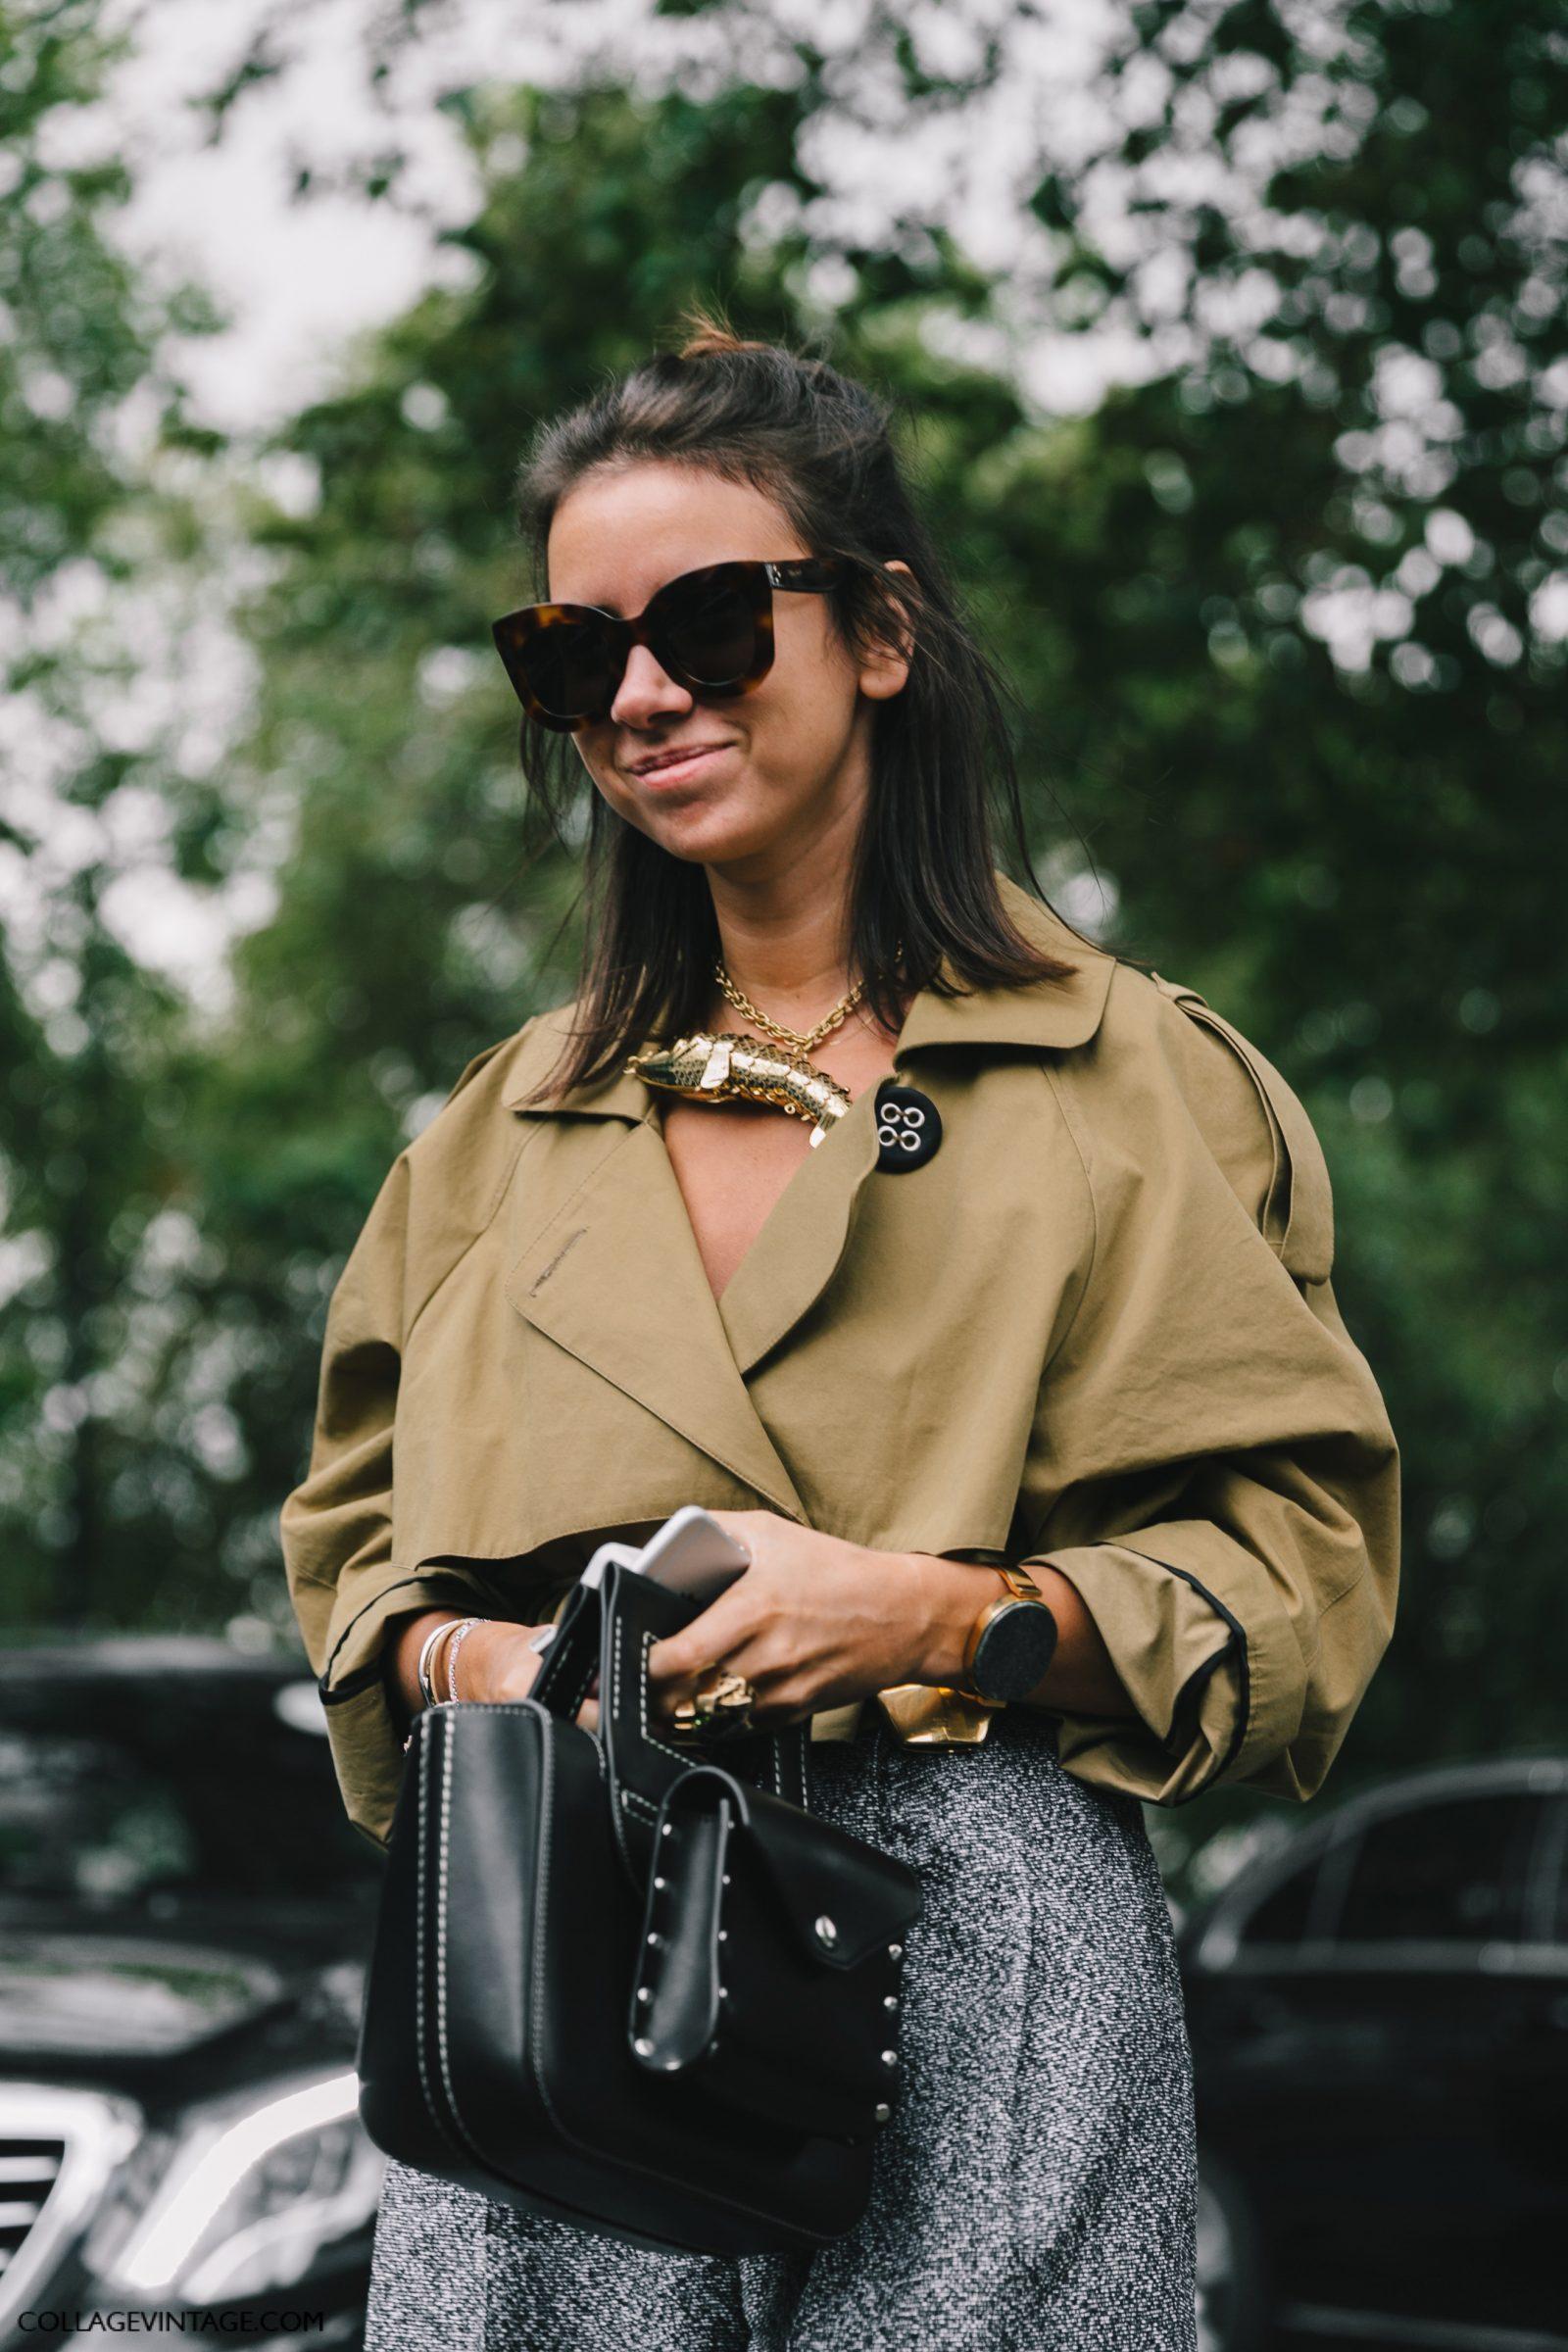 lfw-london_fashion_week_ss17-street_style-outfits-collage_vintage-vintage-roksanda-christopher_kane-joseph-141